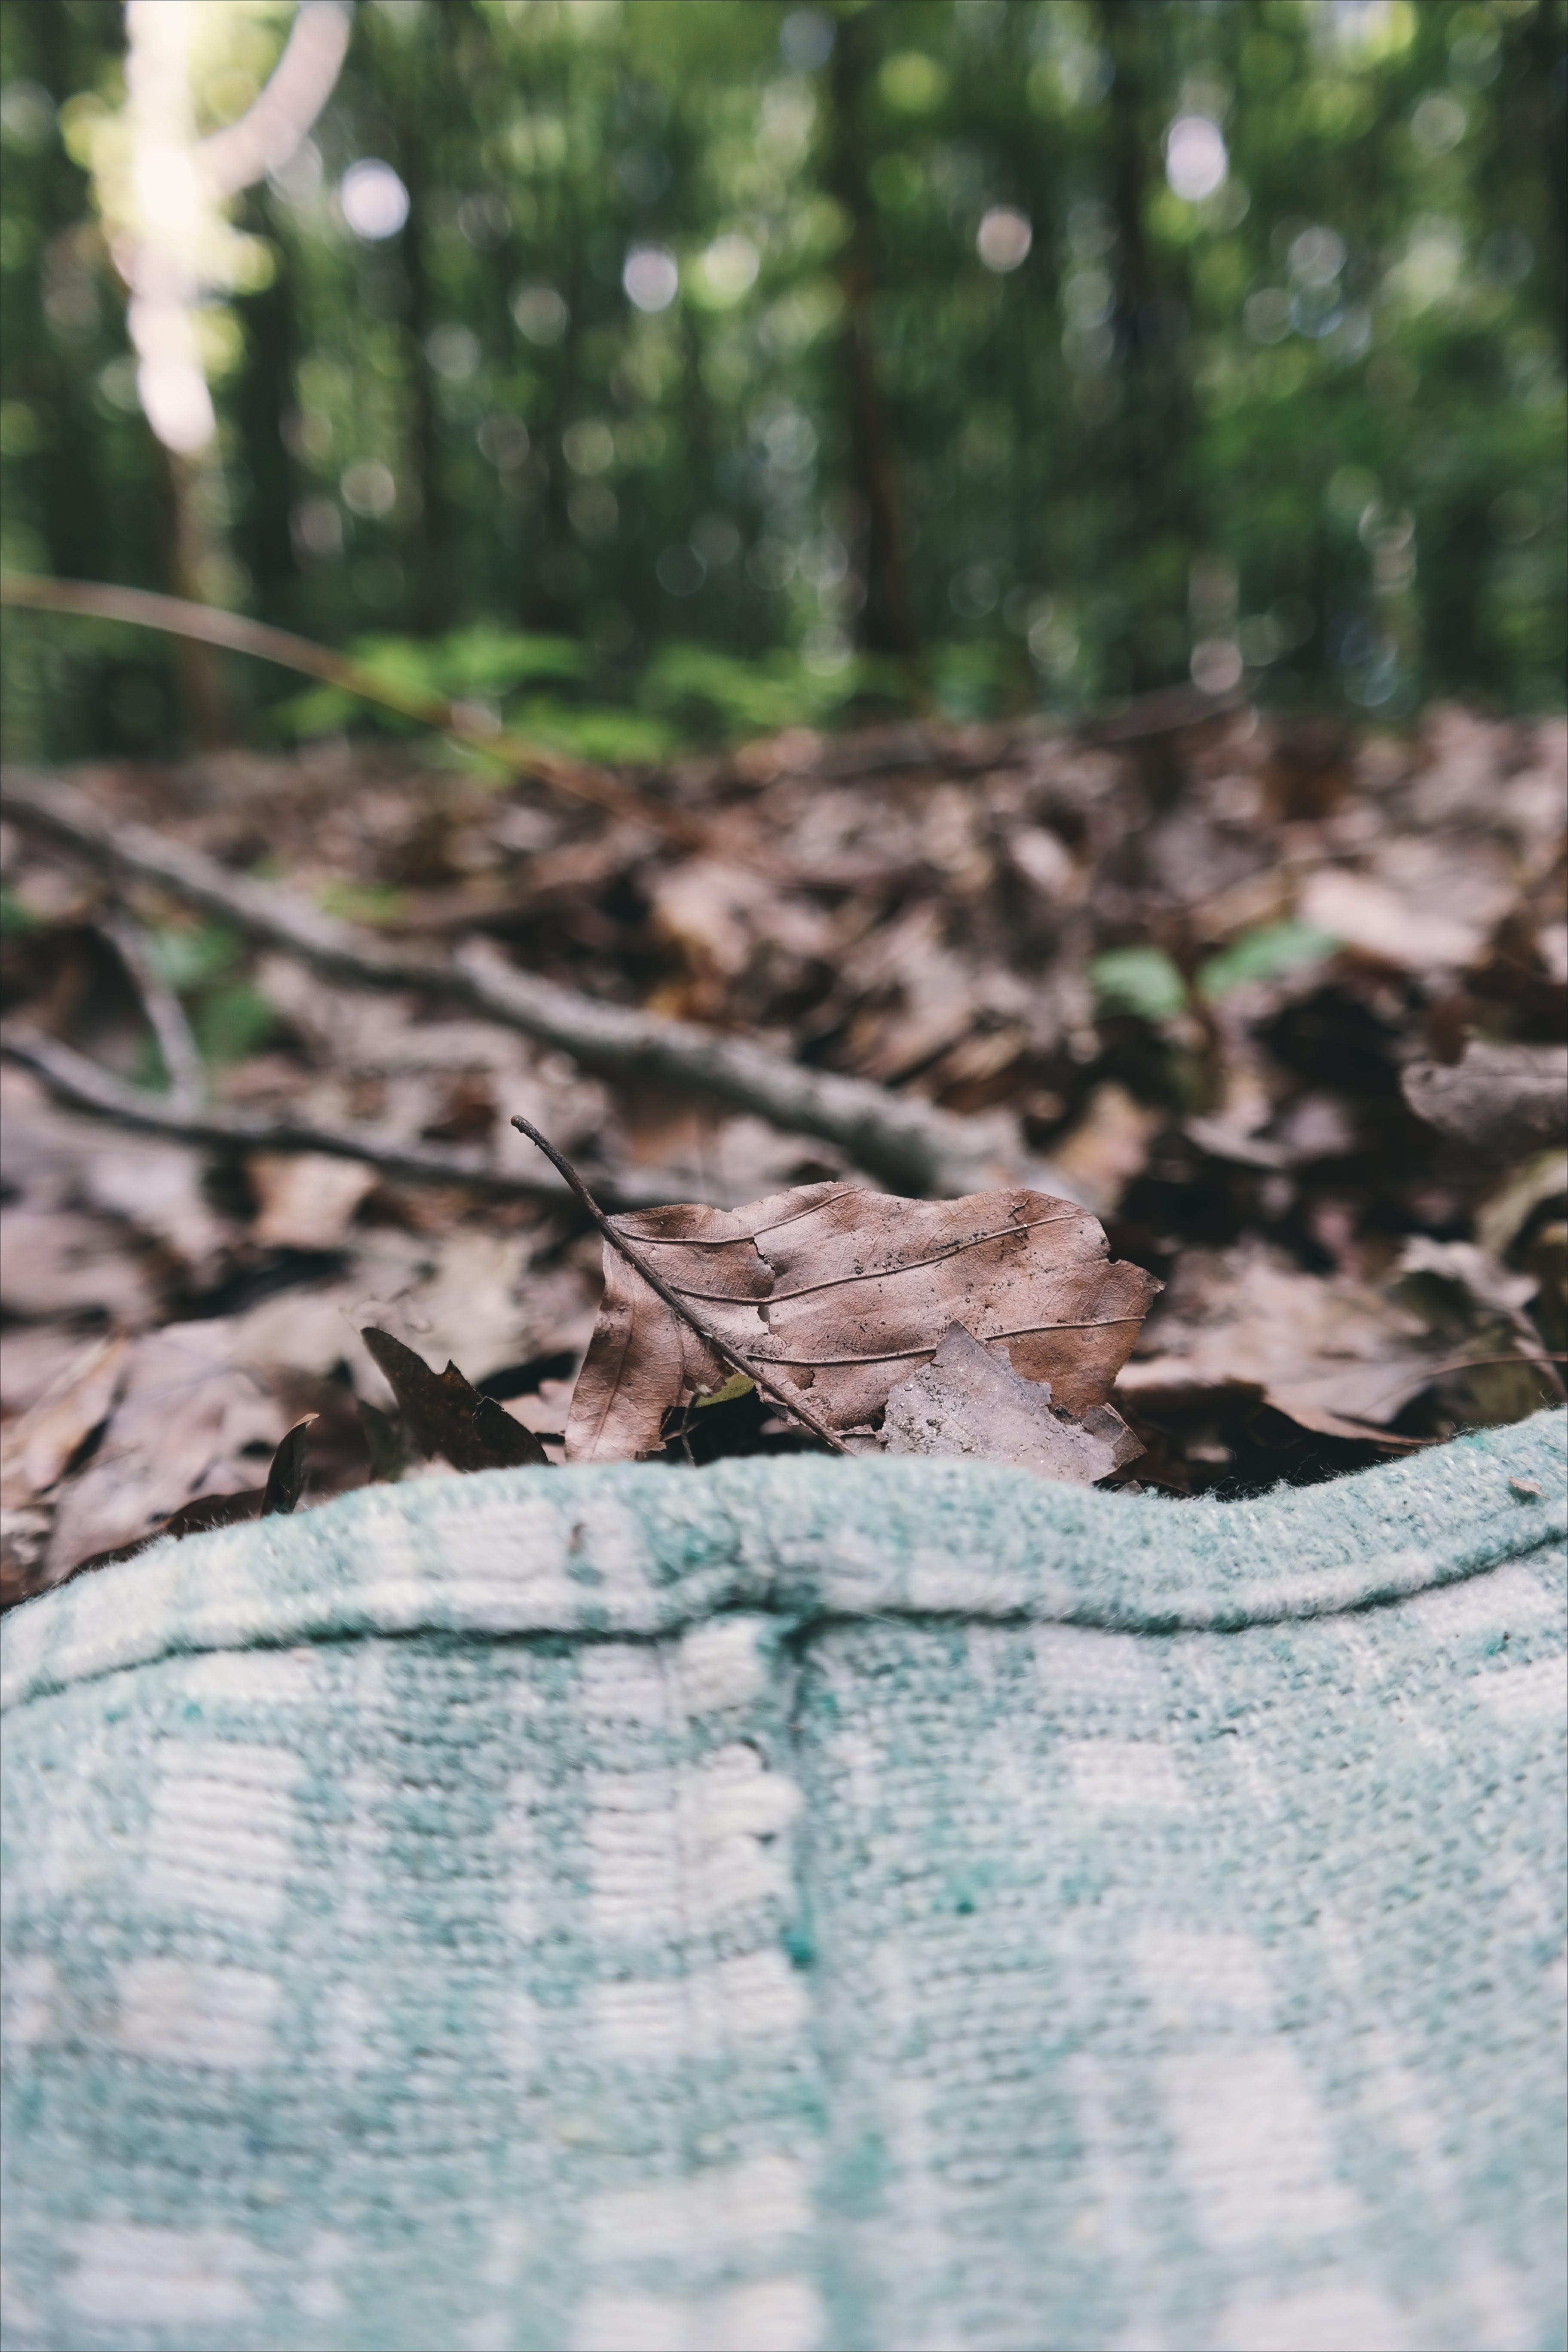 blanket, blur, close-up